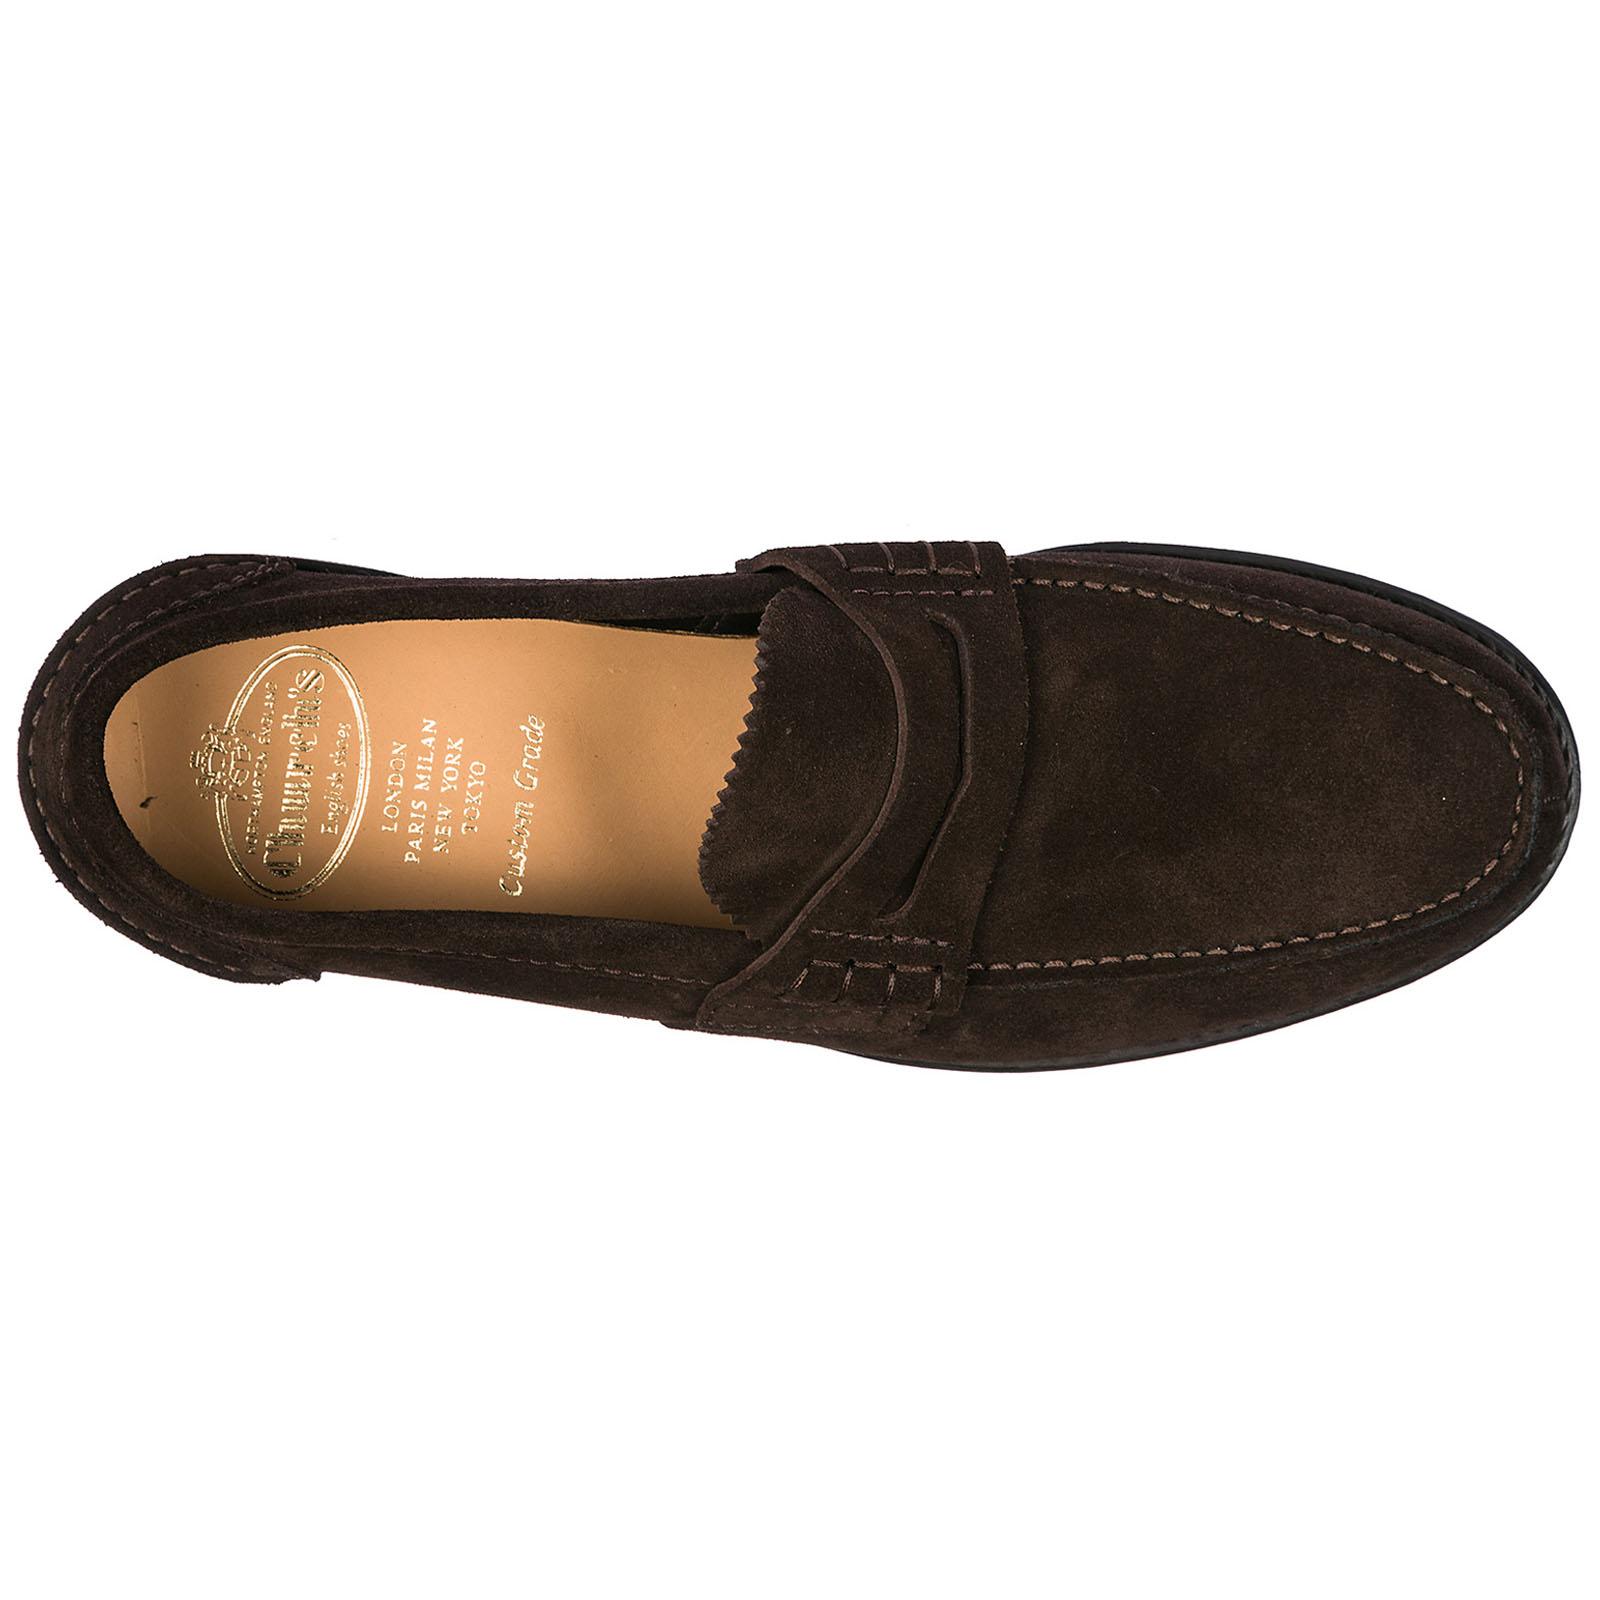 Men's suede loafers moccasins pembrey